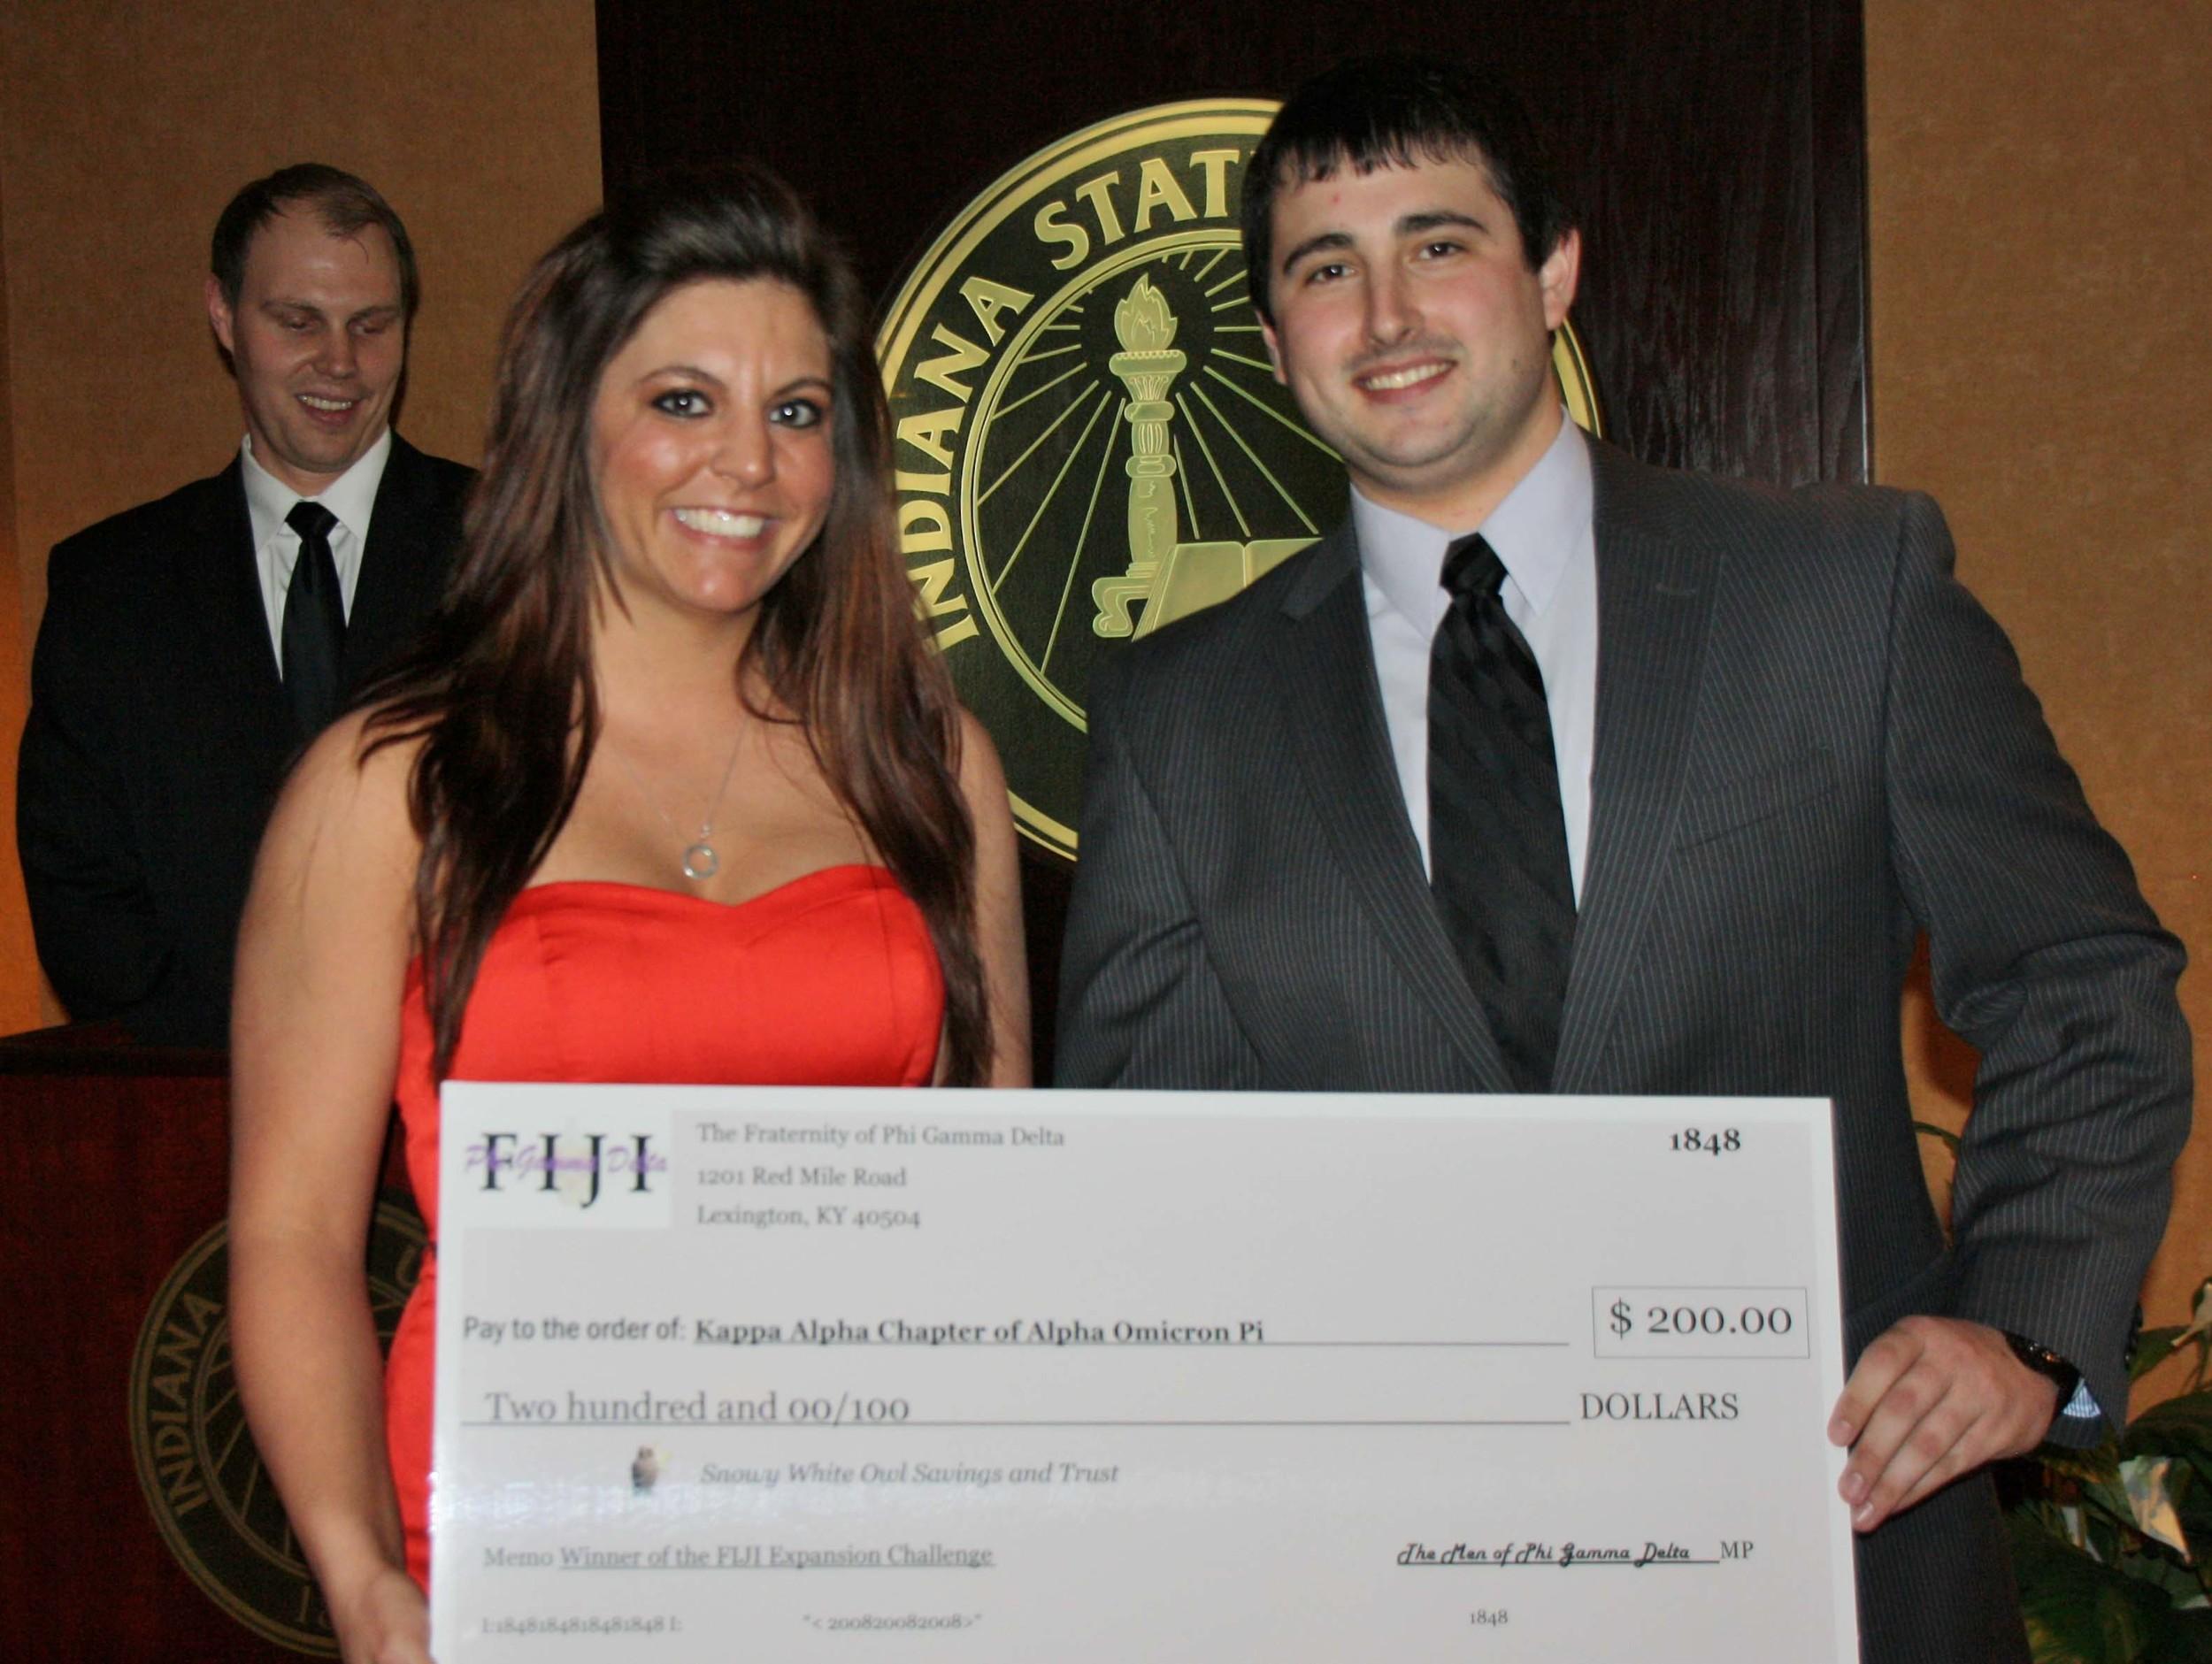 Iota Sigma Delta Colony Pledging Reception - February 24, 2011 (Image 060) - Copy.jpg